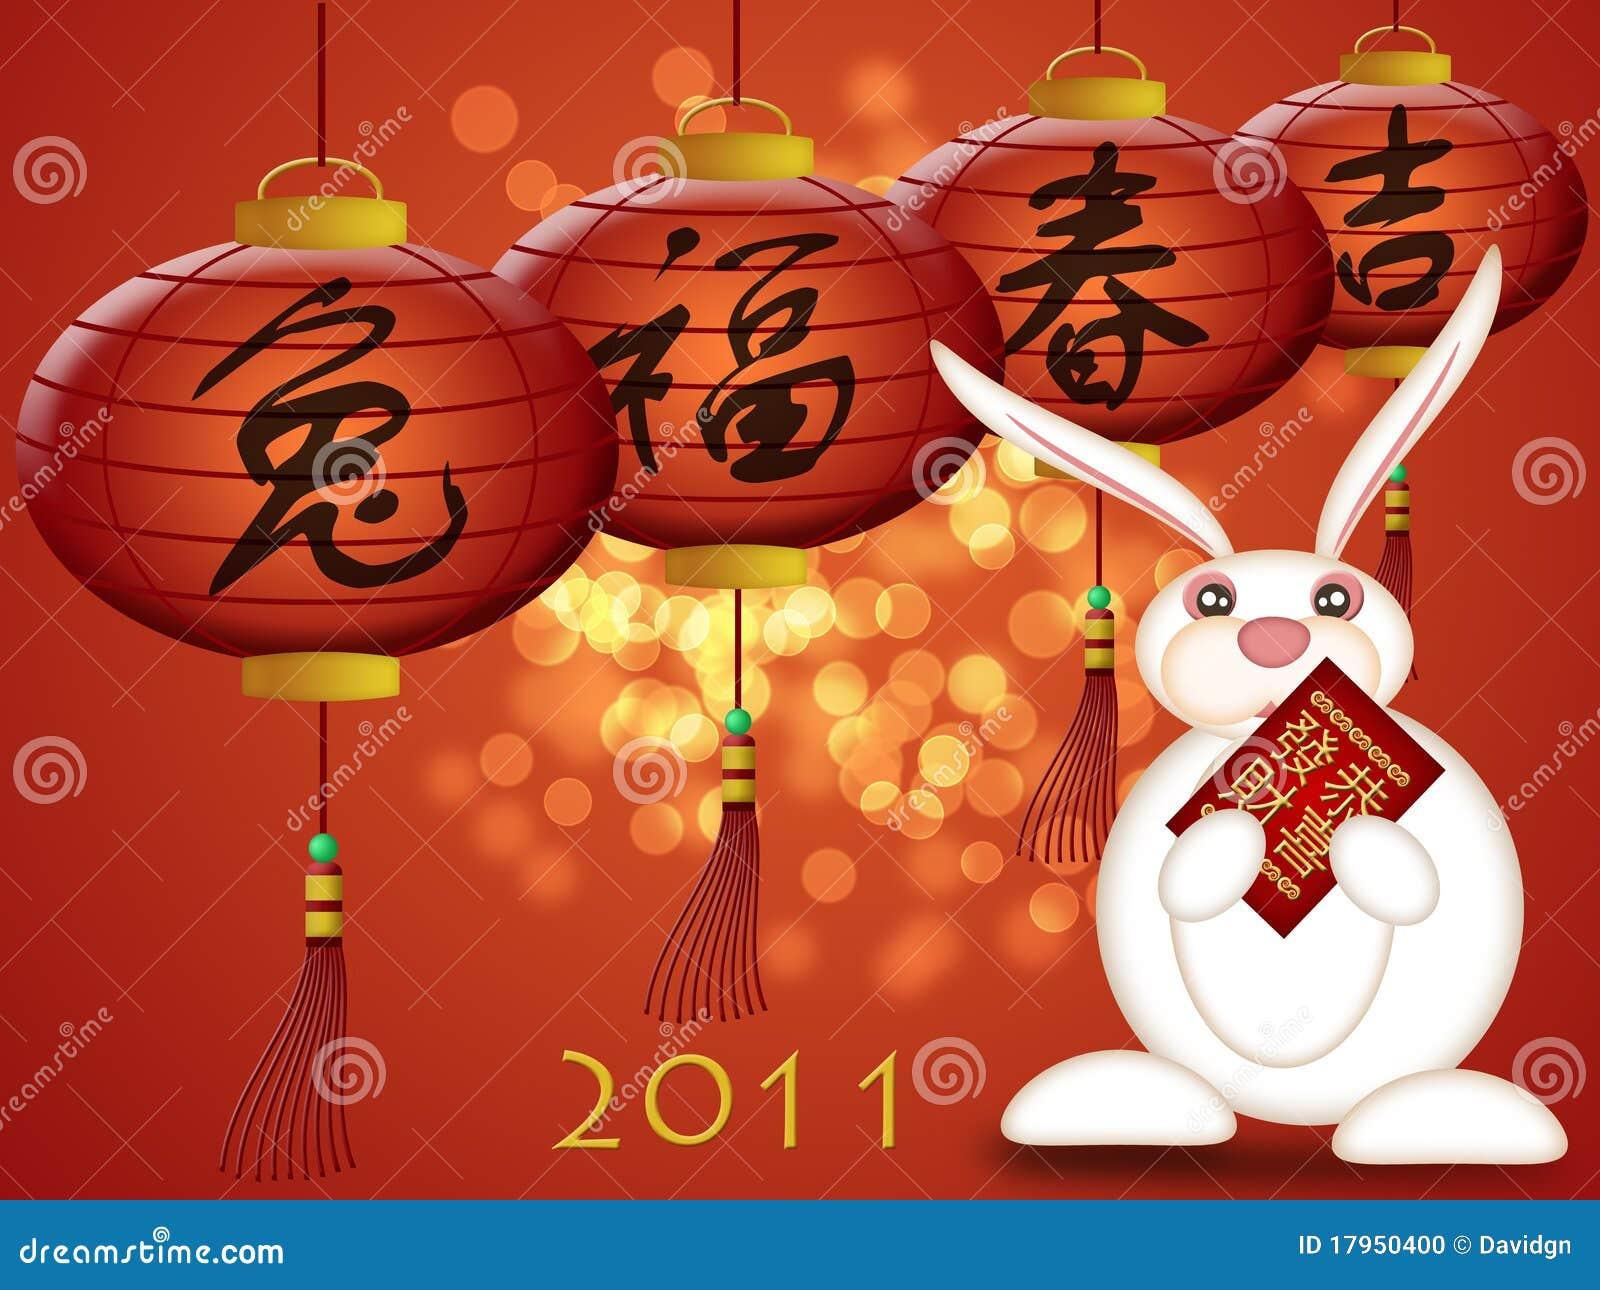 chinese new year 2011 rabbit red money packet - Chinese New Year 2011